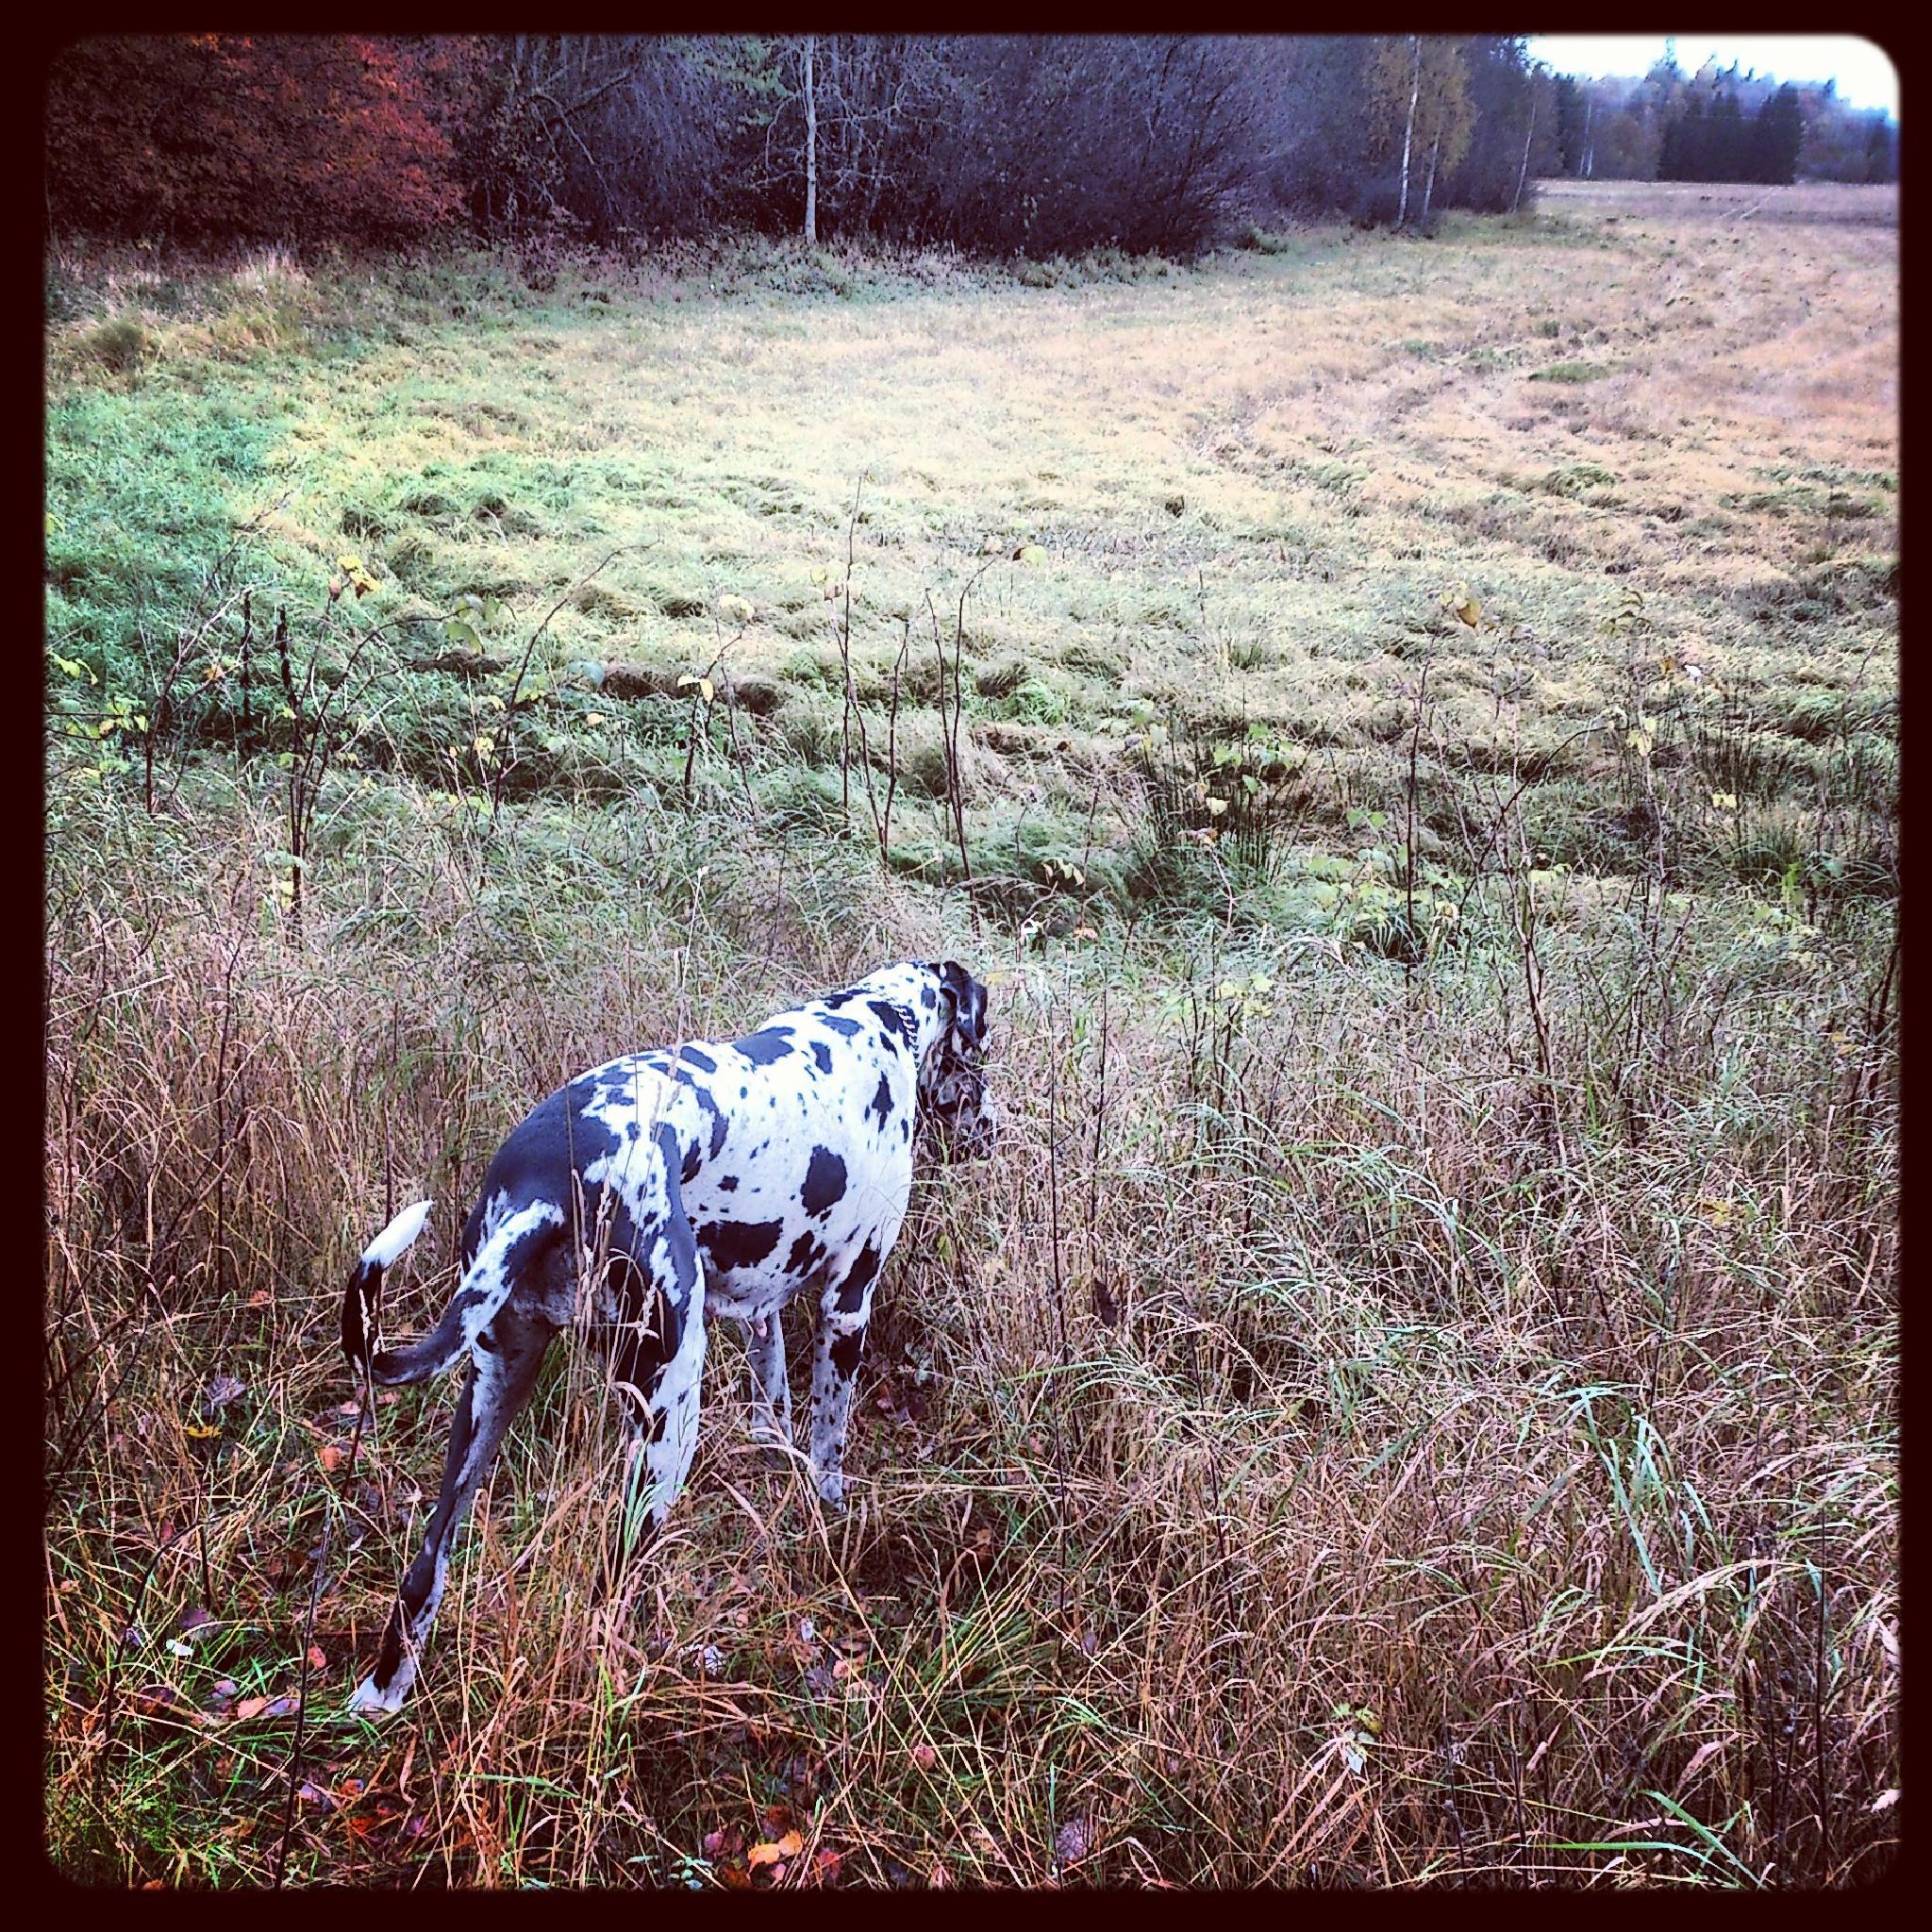 My Great Dane Bonnie by Anna Pettersson Skalstad